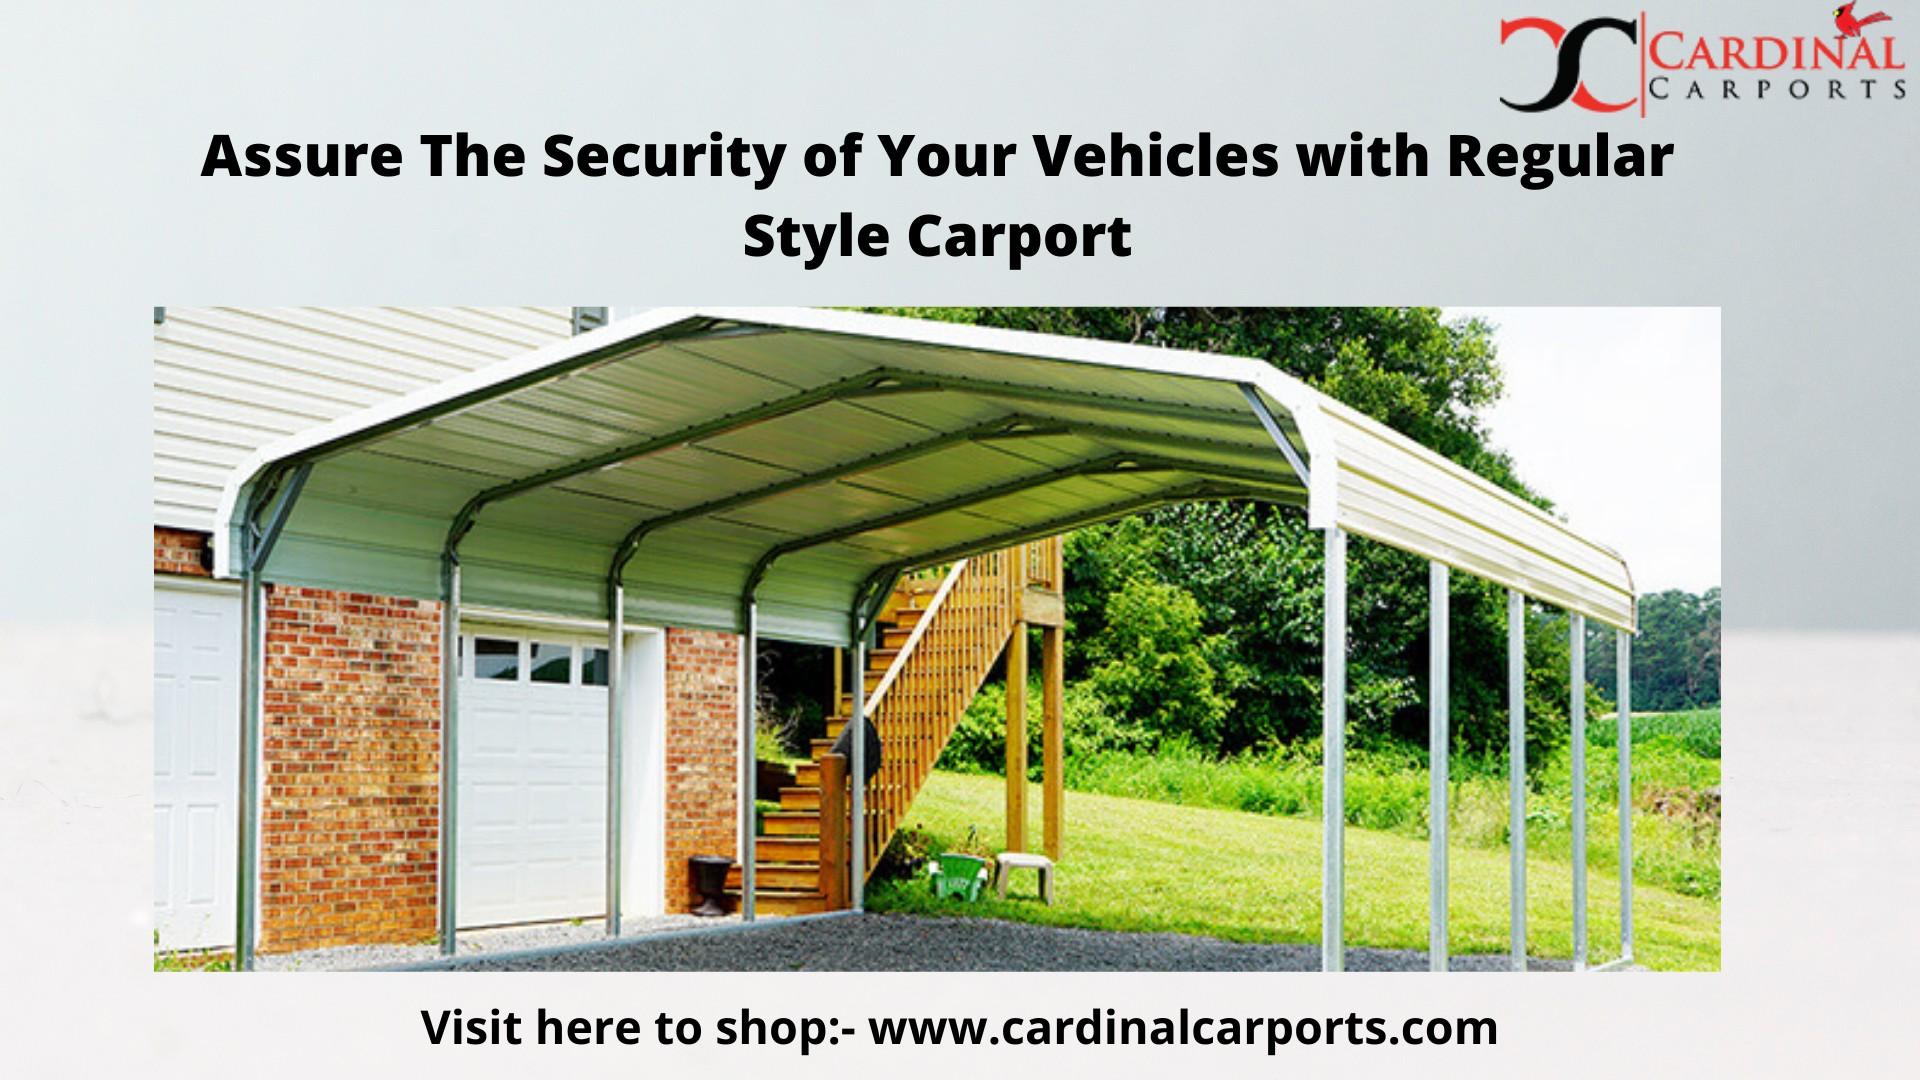 Regular Style Carport - Something Extremely Useful to Meet Shelter Needs for Vehicles